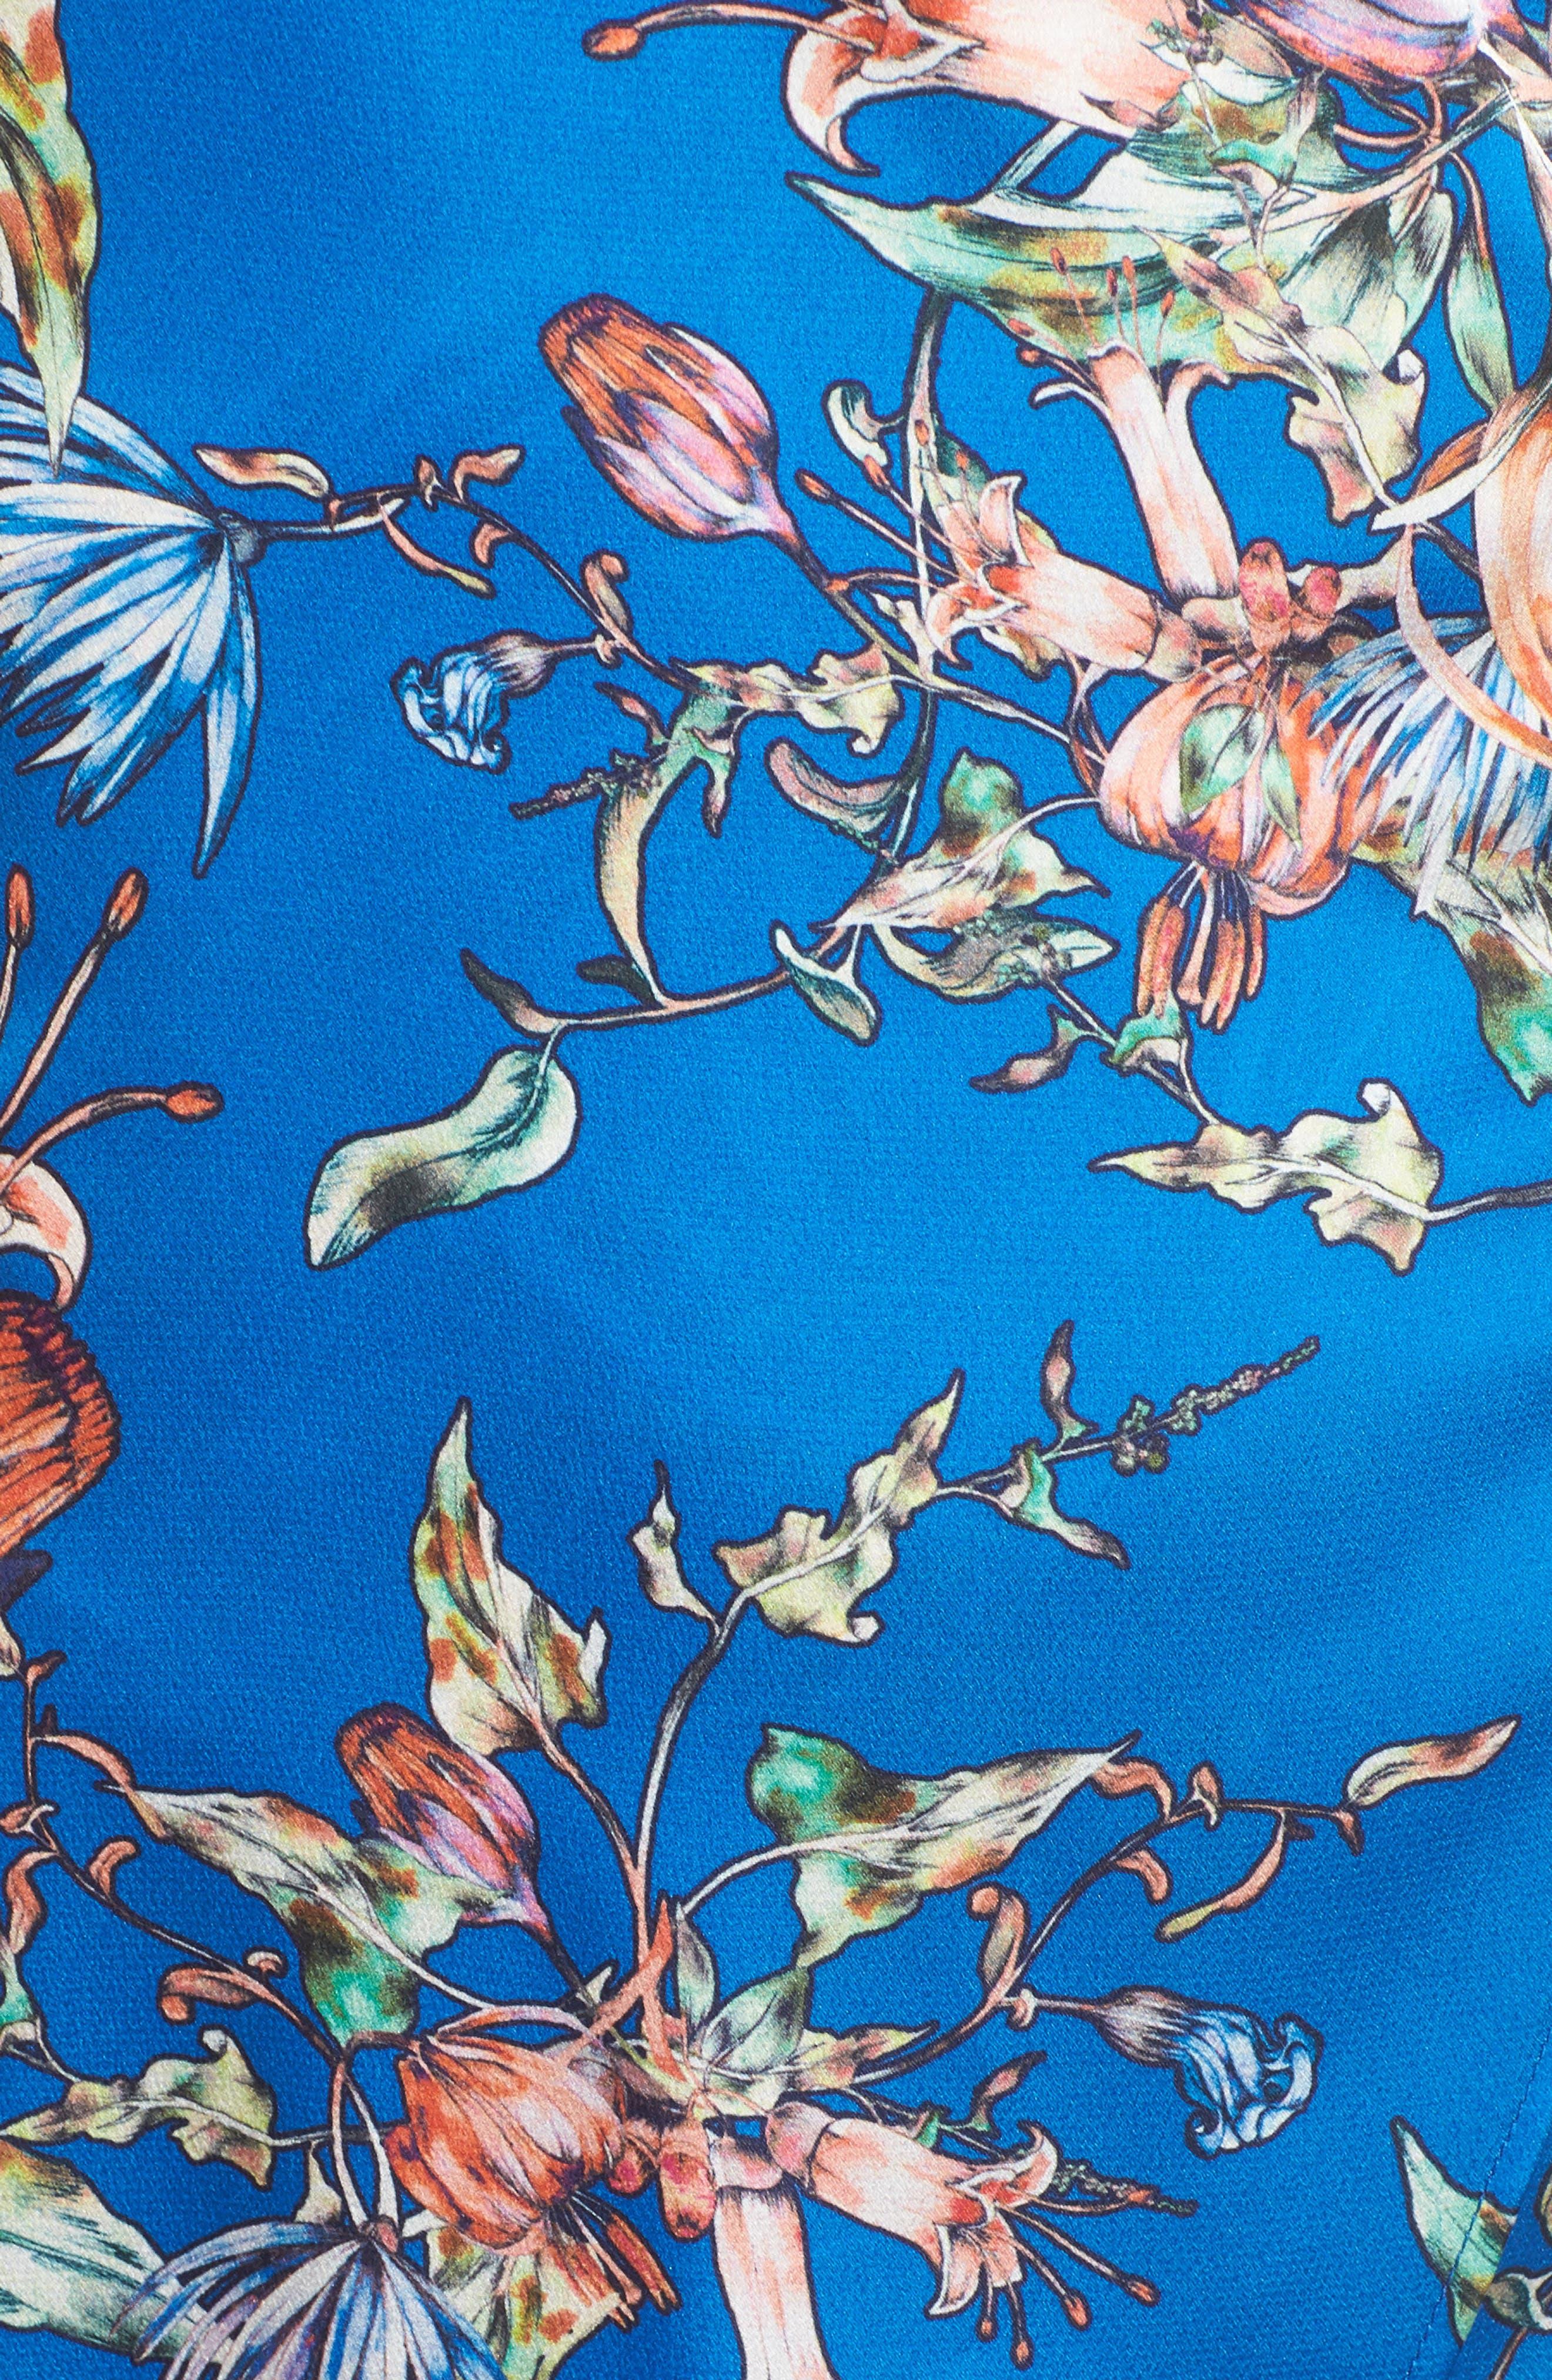 Floral Print Satin Faux Wrap Dress,                             Alternate thumbnail 6, color,                             Royal